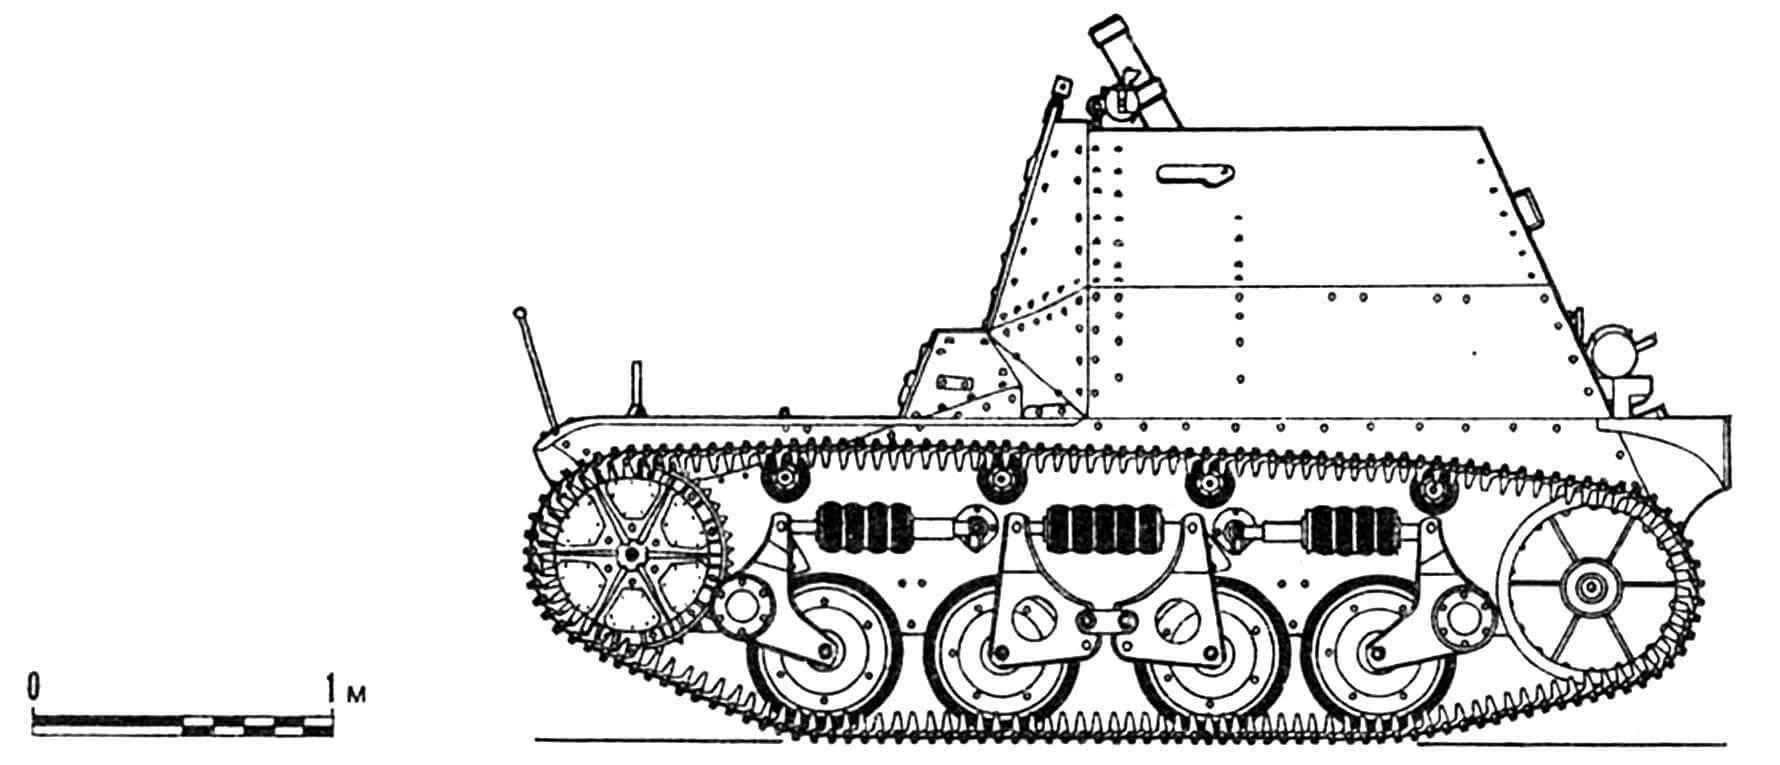 8-cm s. Granatwerfer 34 на базе танка AMR